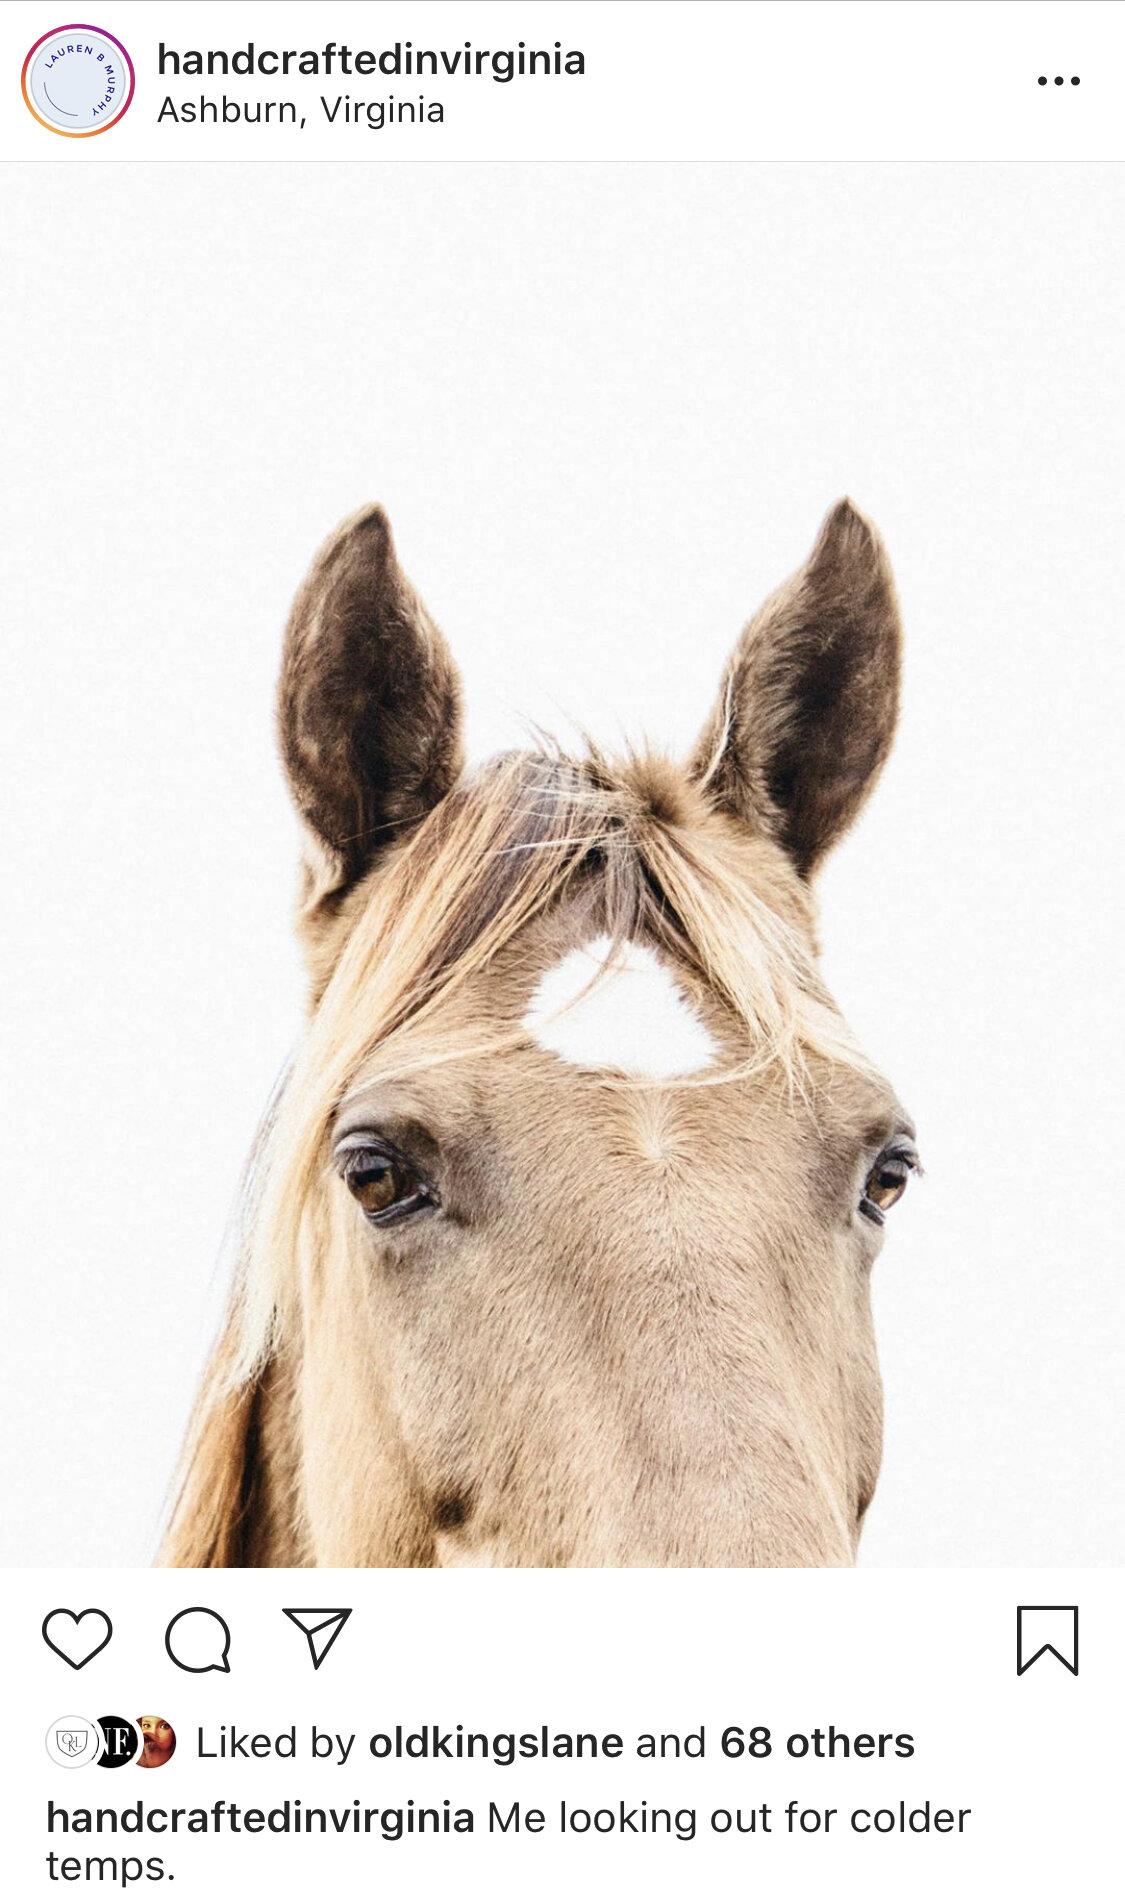 horse handcrafted in virginia